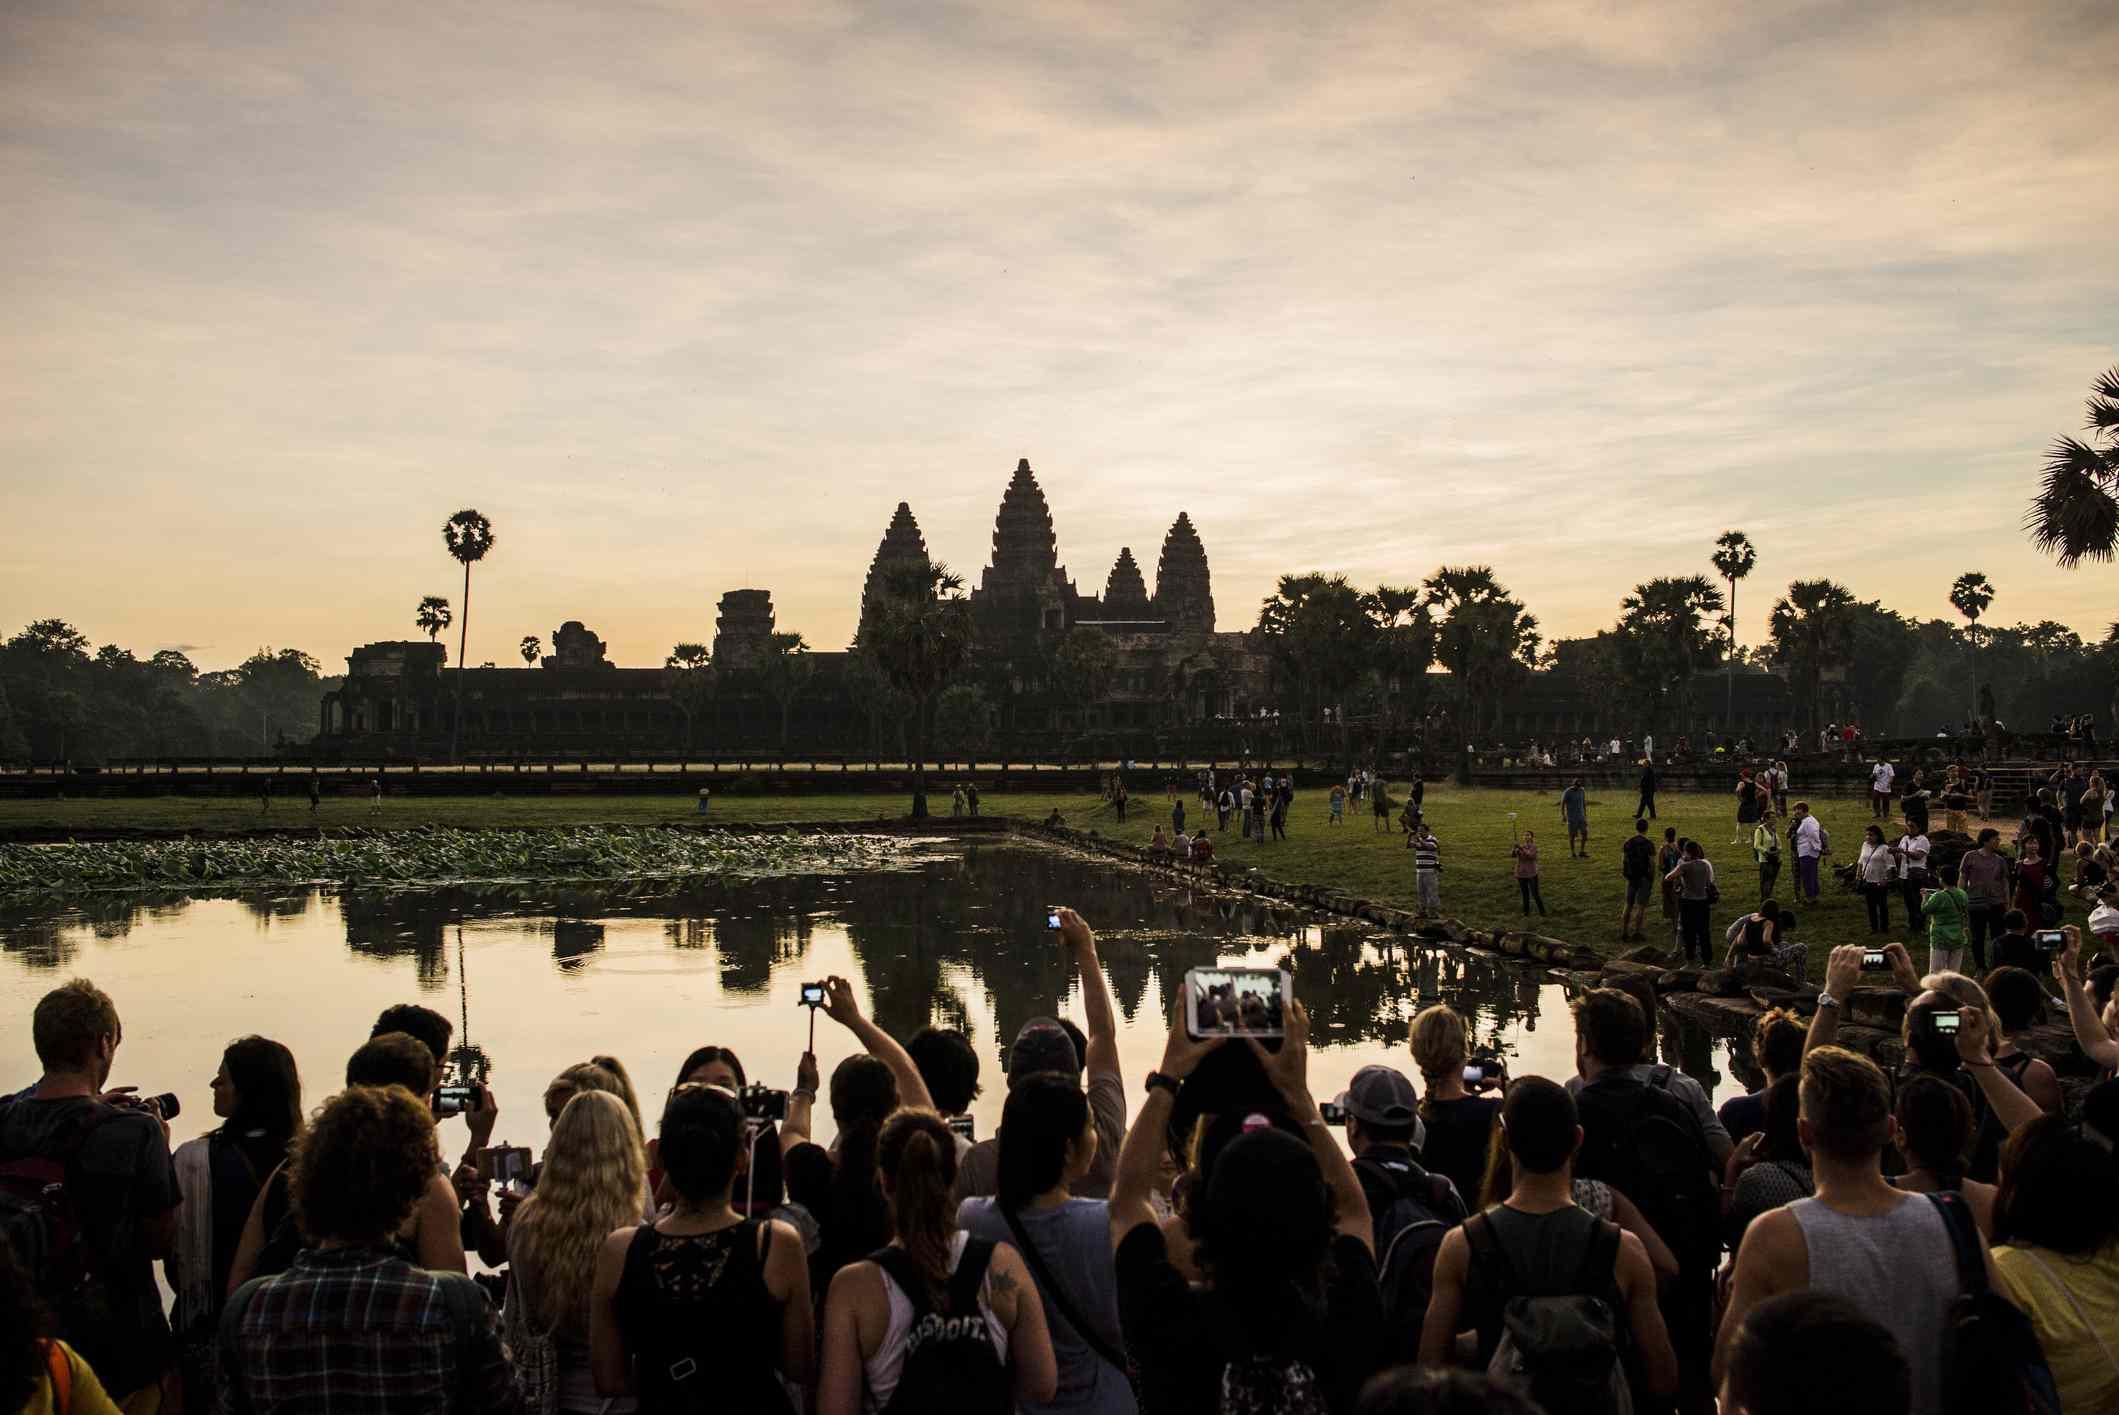 Tourists taking photos of sunrise, Angkor Wat, Siem Reap, Cambodia